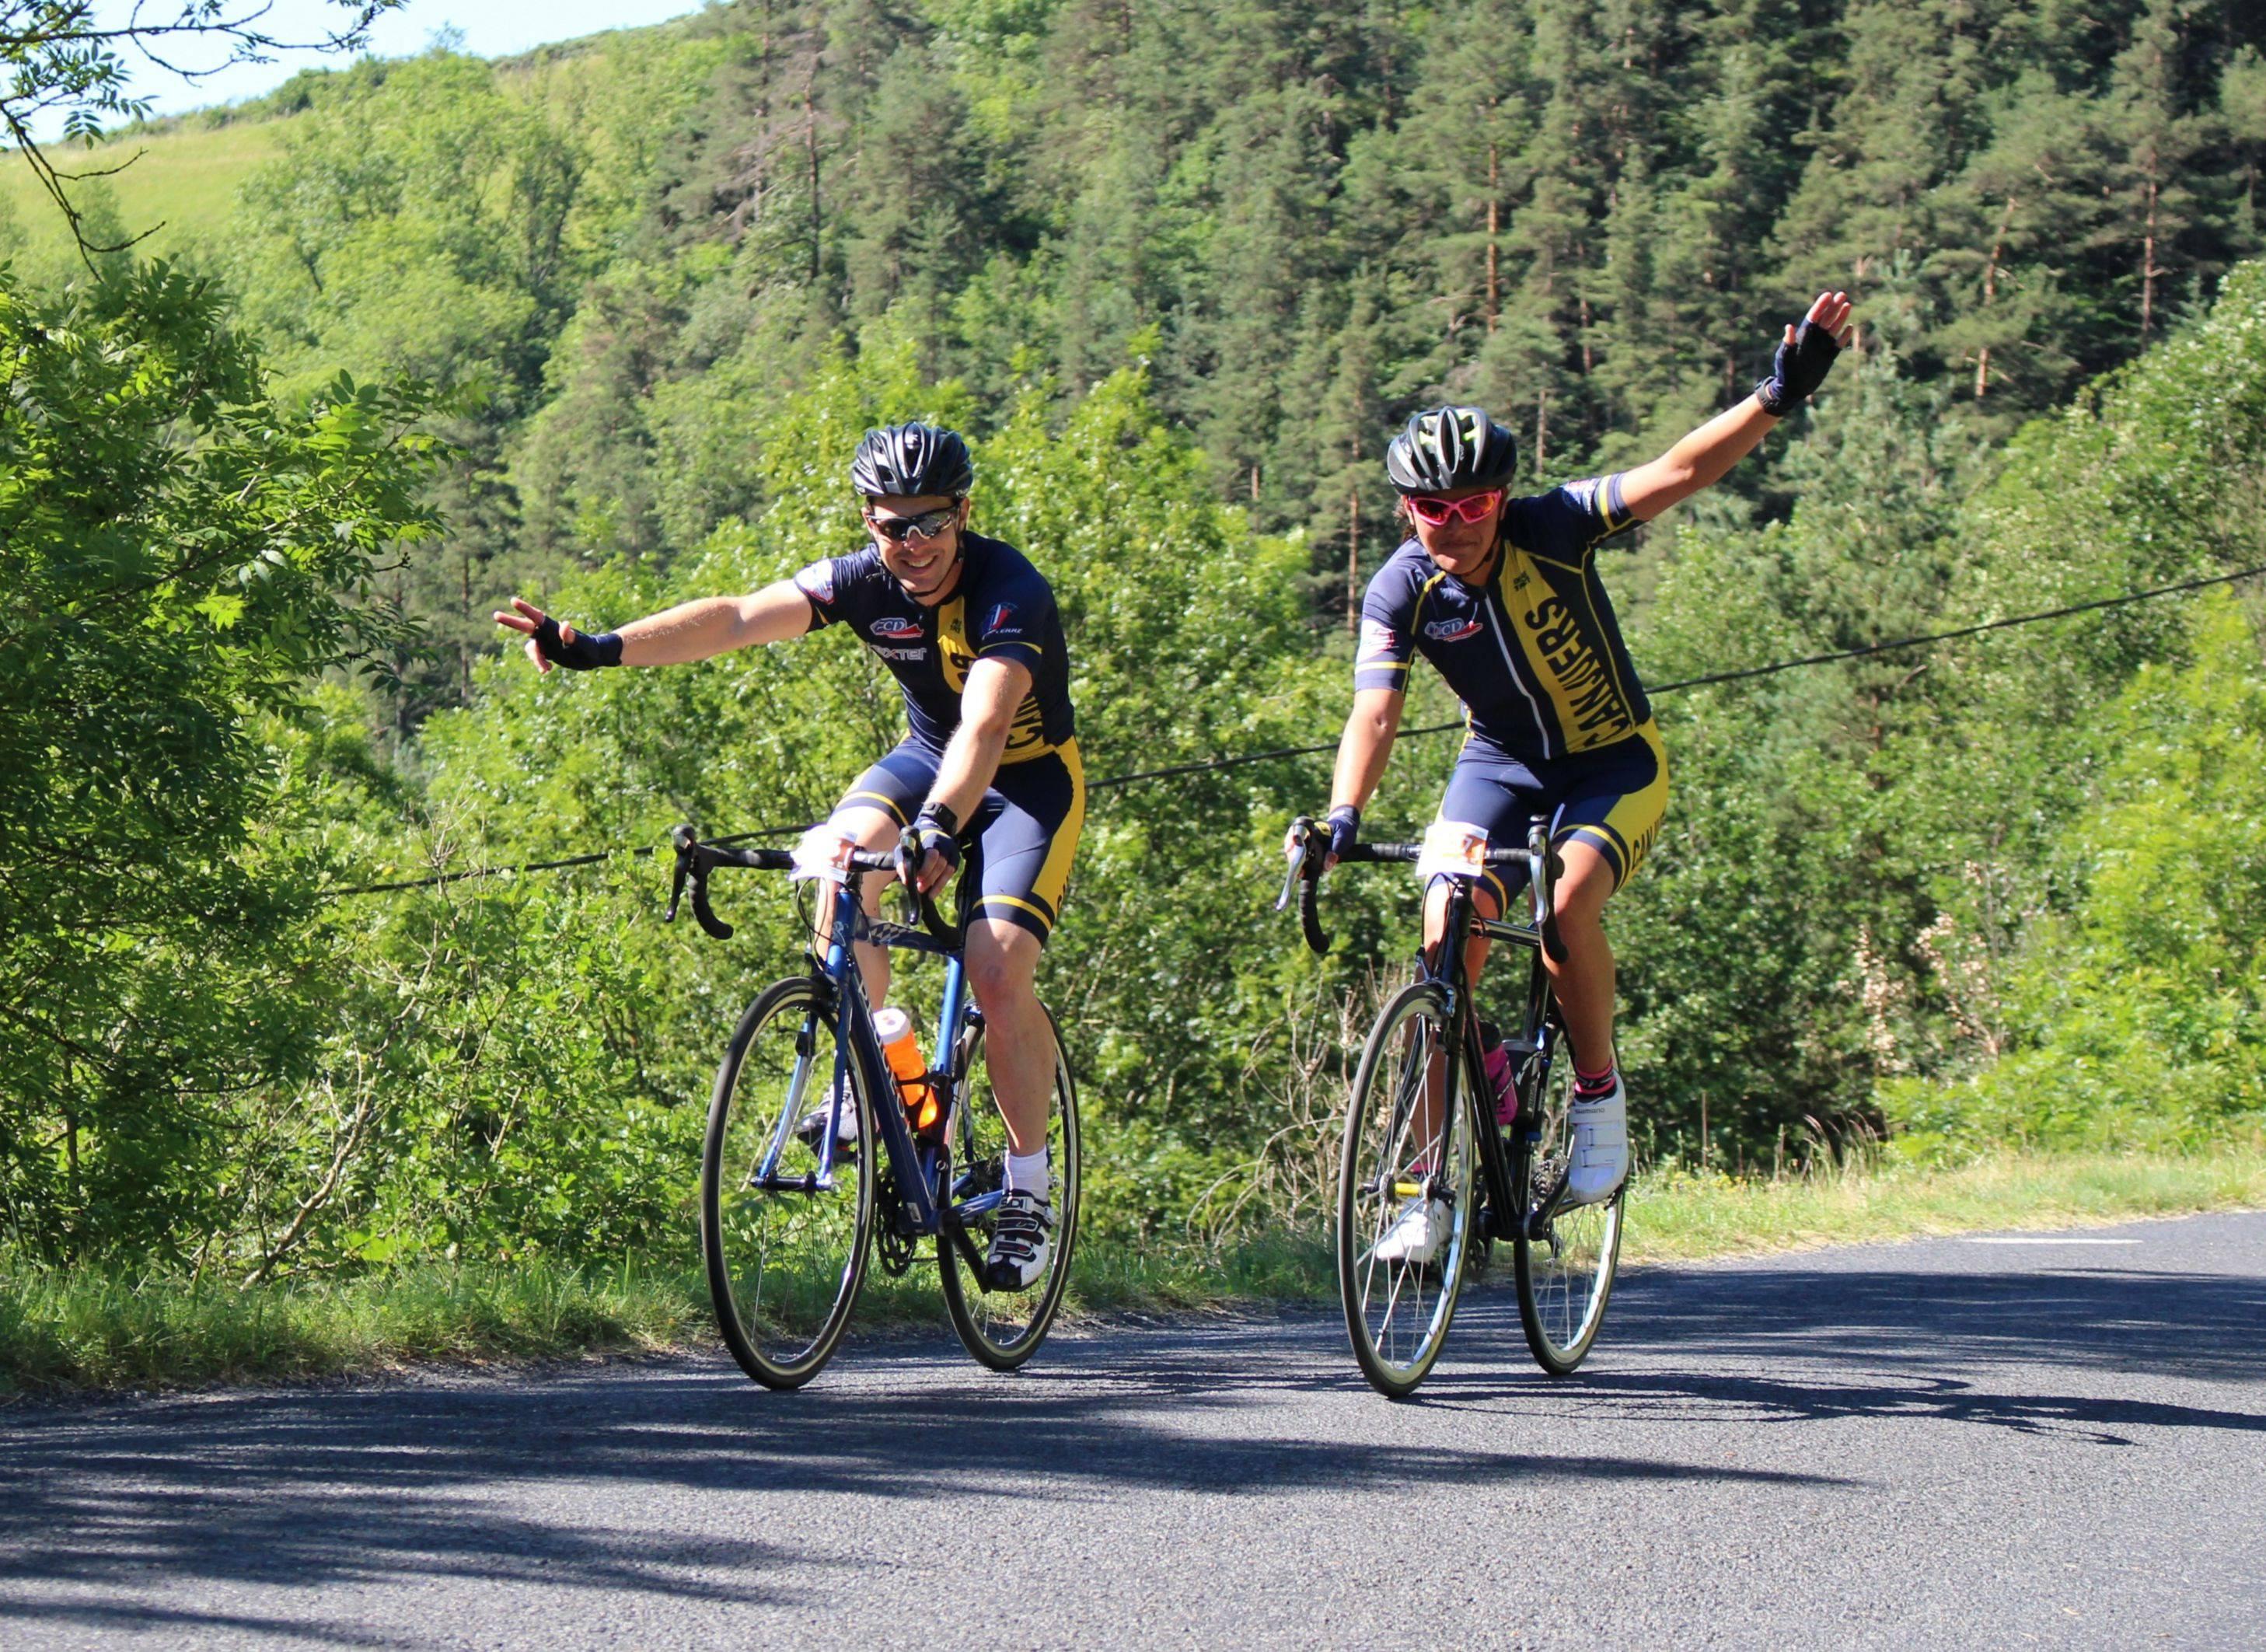 Cyclo route in Ardèche Verte